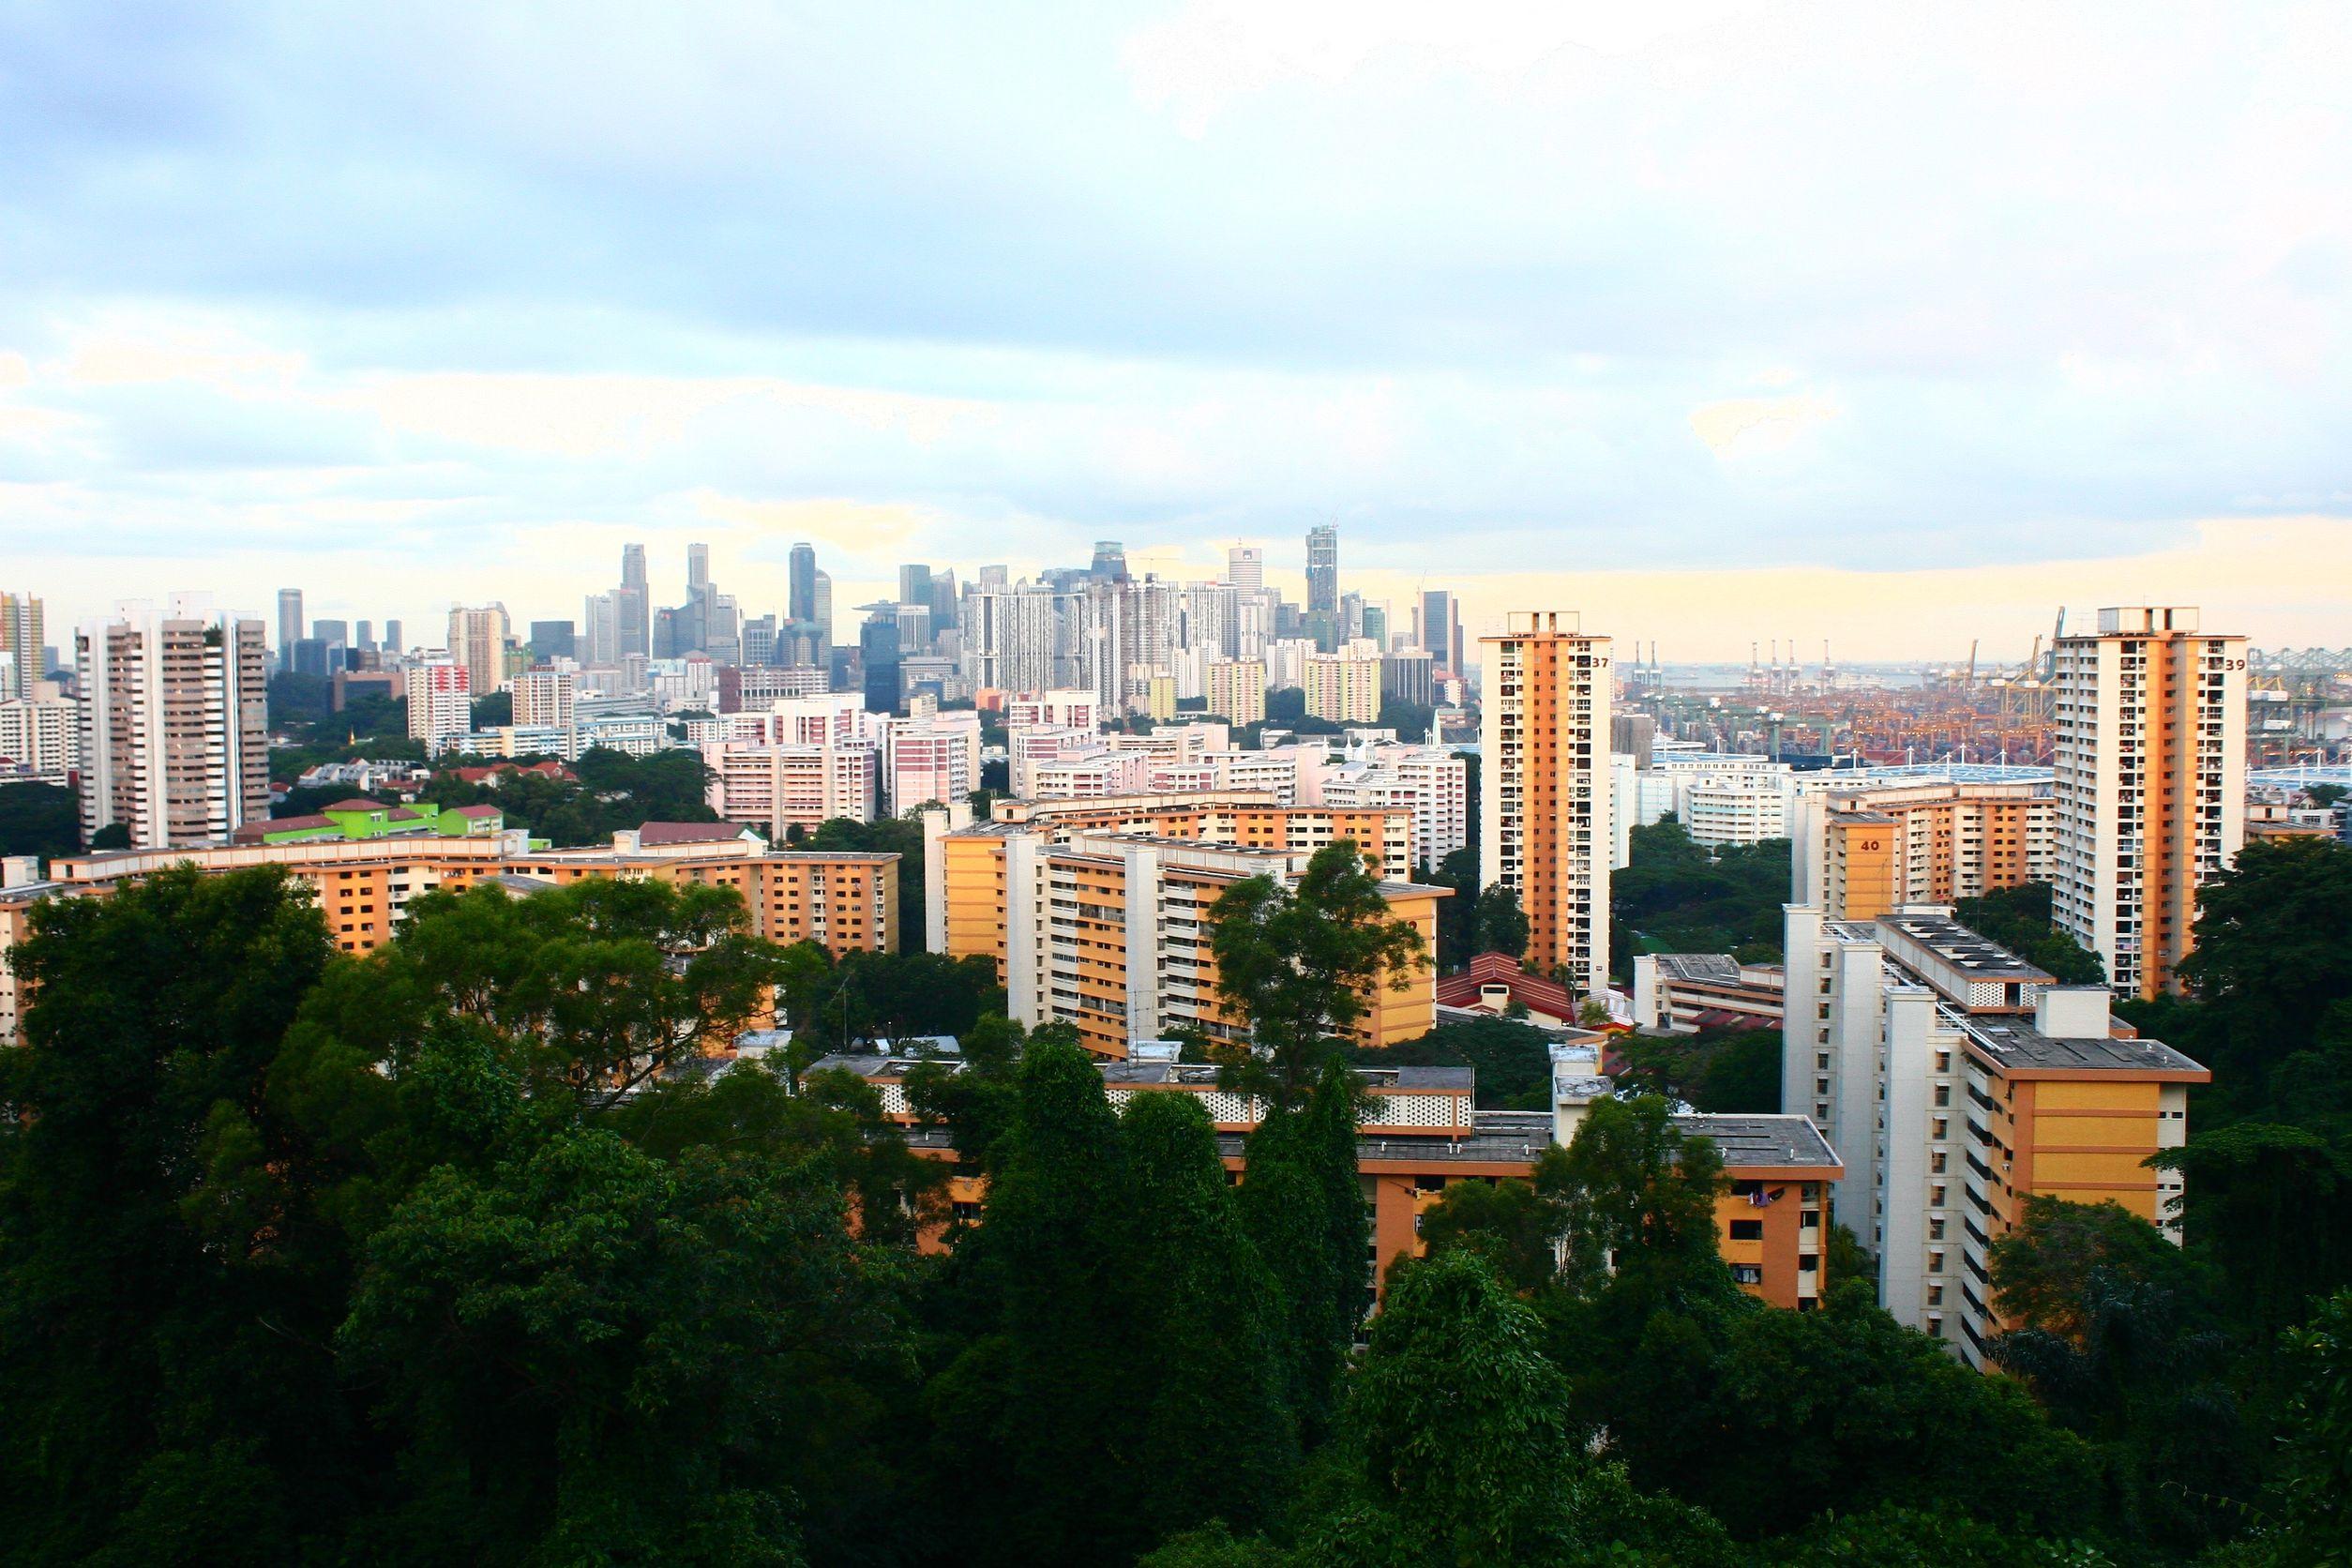 22574566 - singapore public housing, urban landscape hdb flats